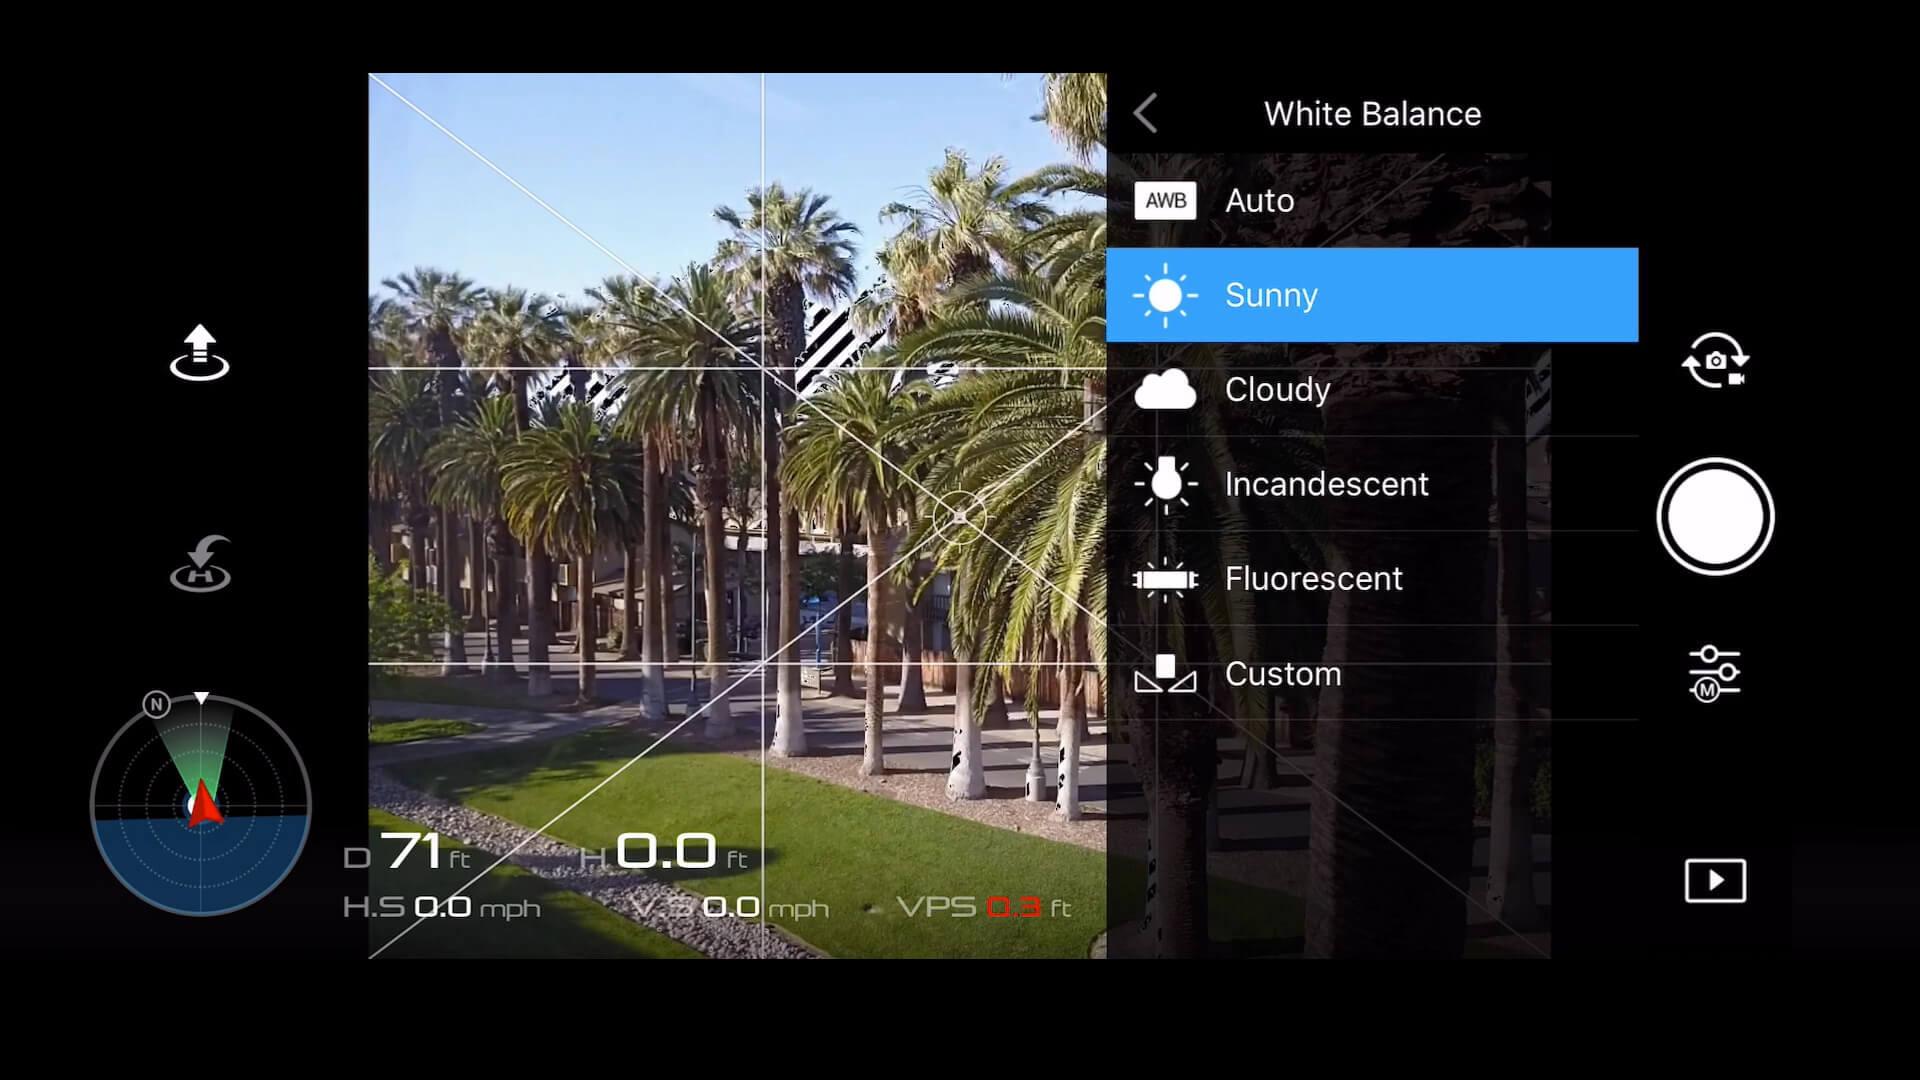 24 basic camera settings for dji drone photos - white balance